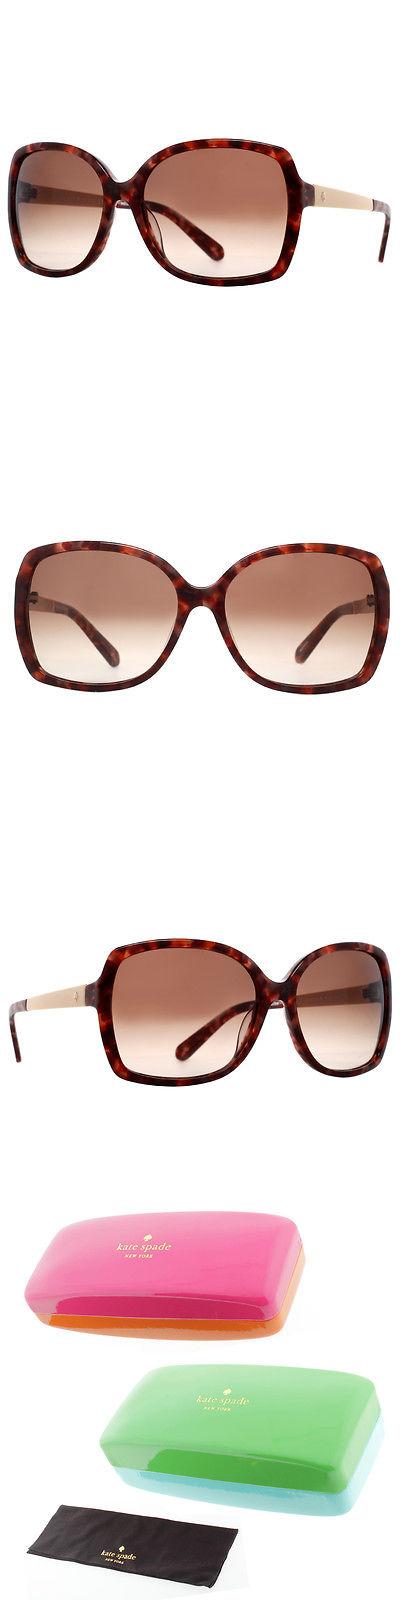 f02795337387f Sunglasses 45246  Kate Spade New York Darilynn S Jdqb1 Havana Brown Gold  Women S Sunglasses